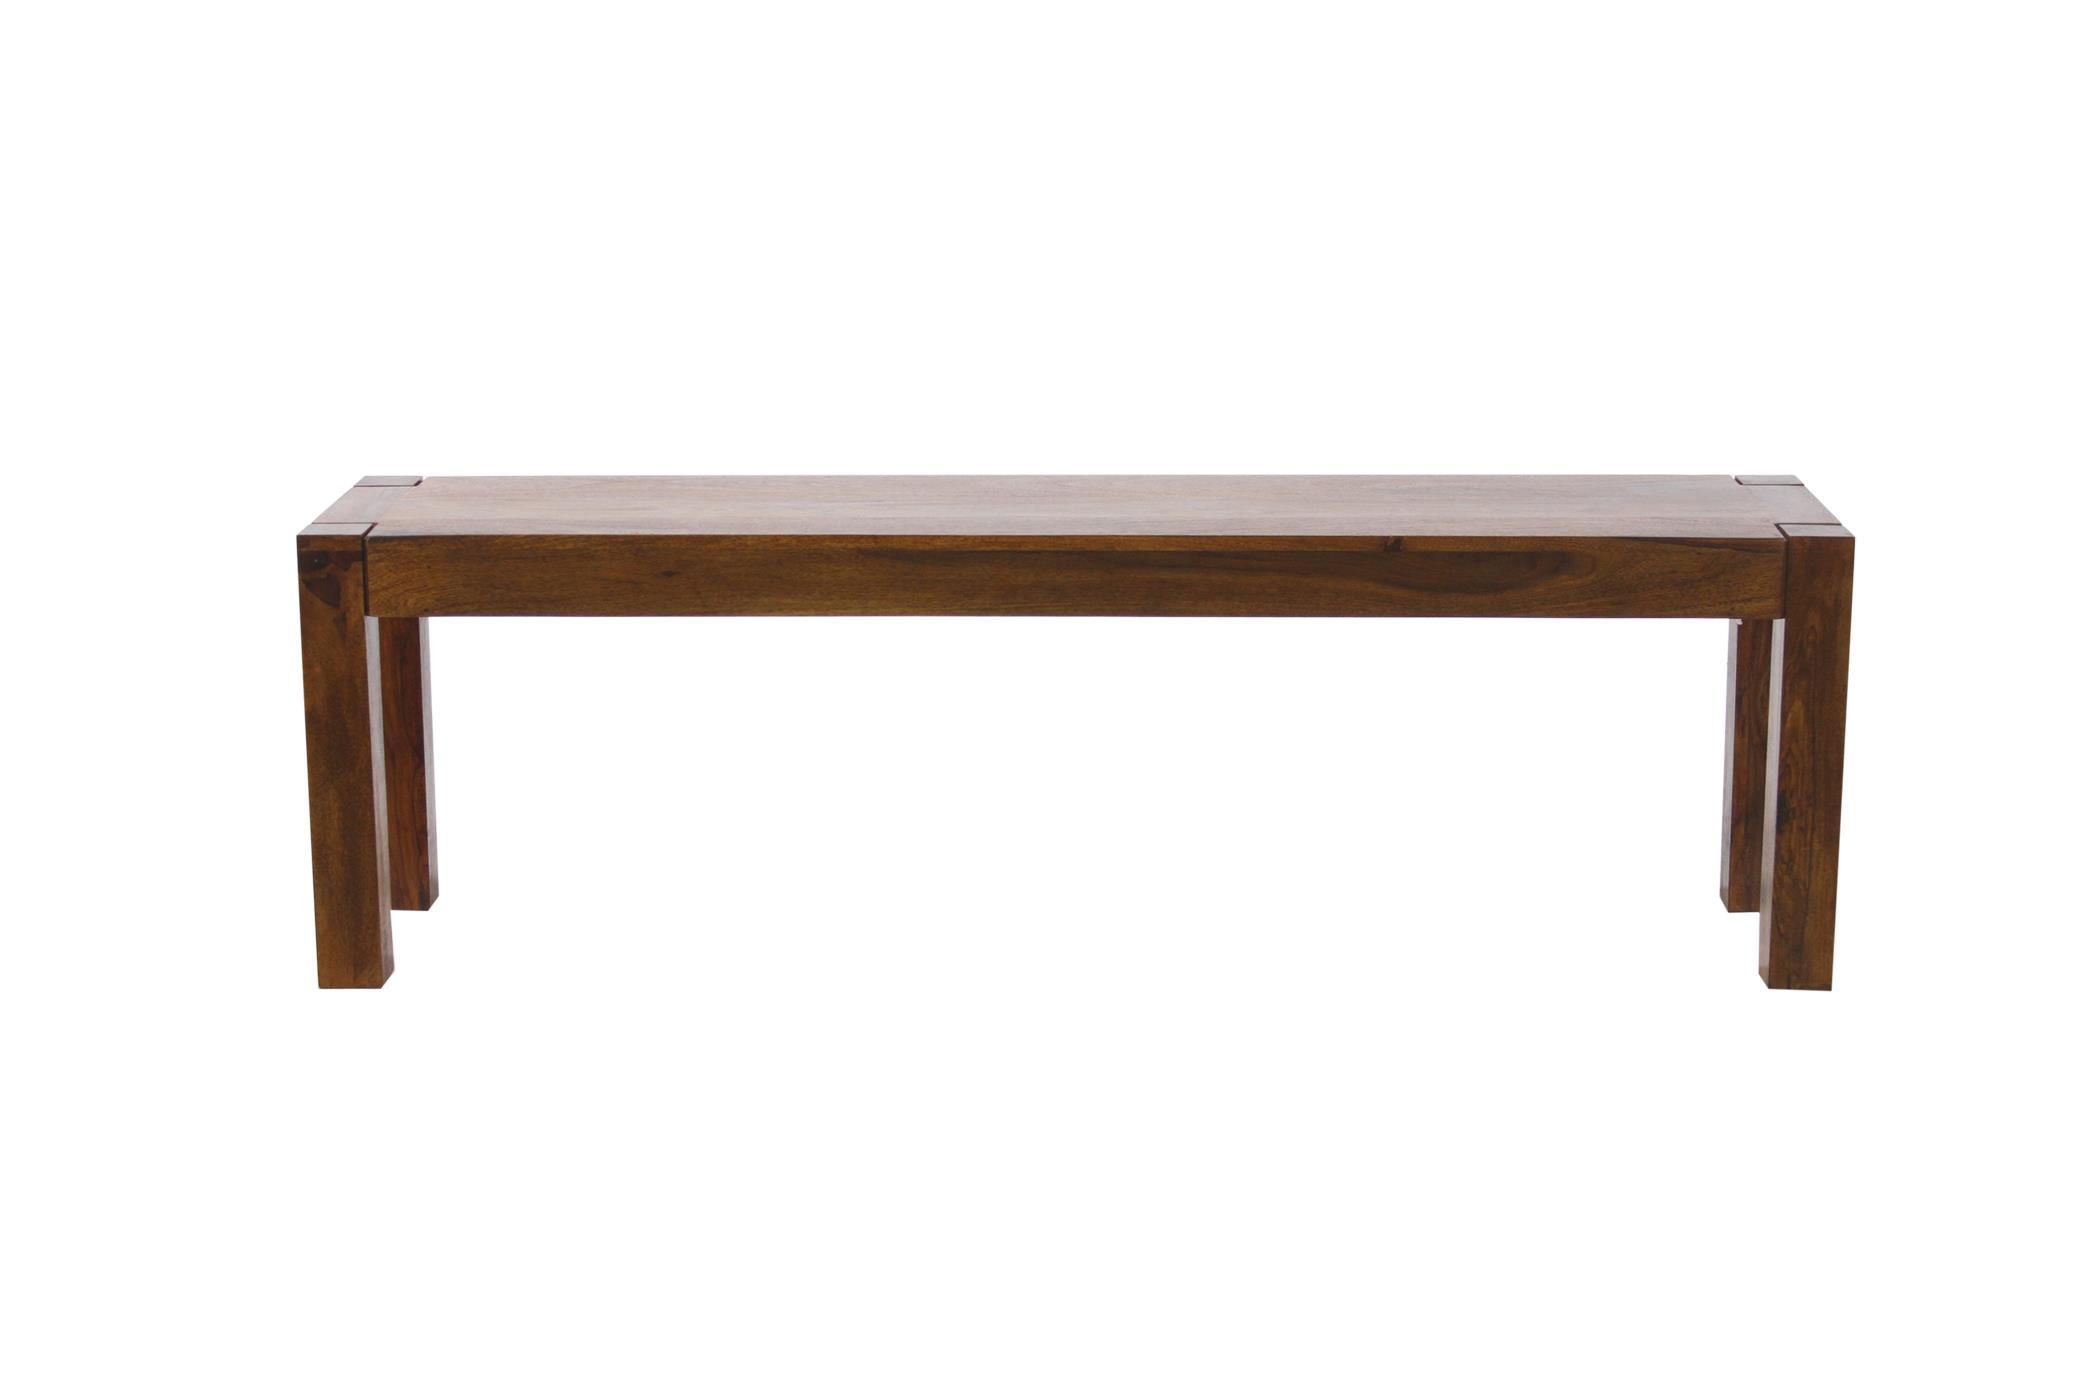 Modus International Genus Dining Bench - Item Number: 5A-46-73T